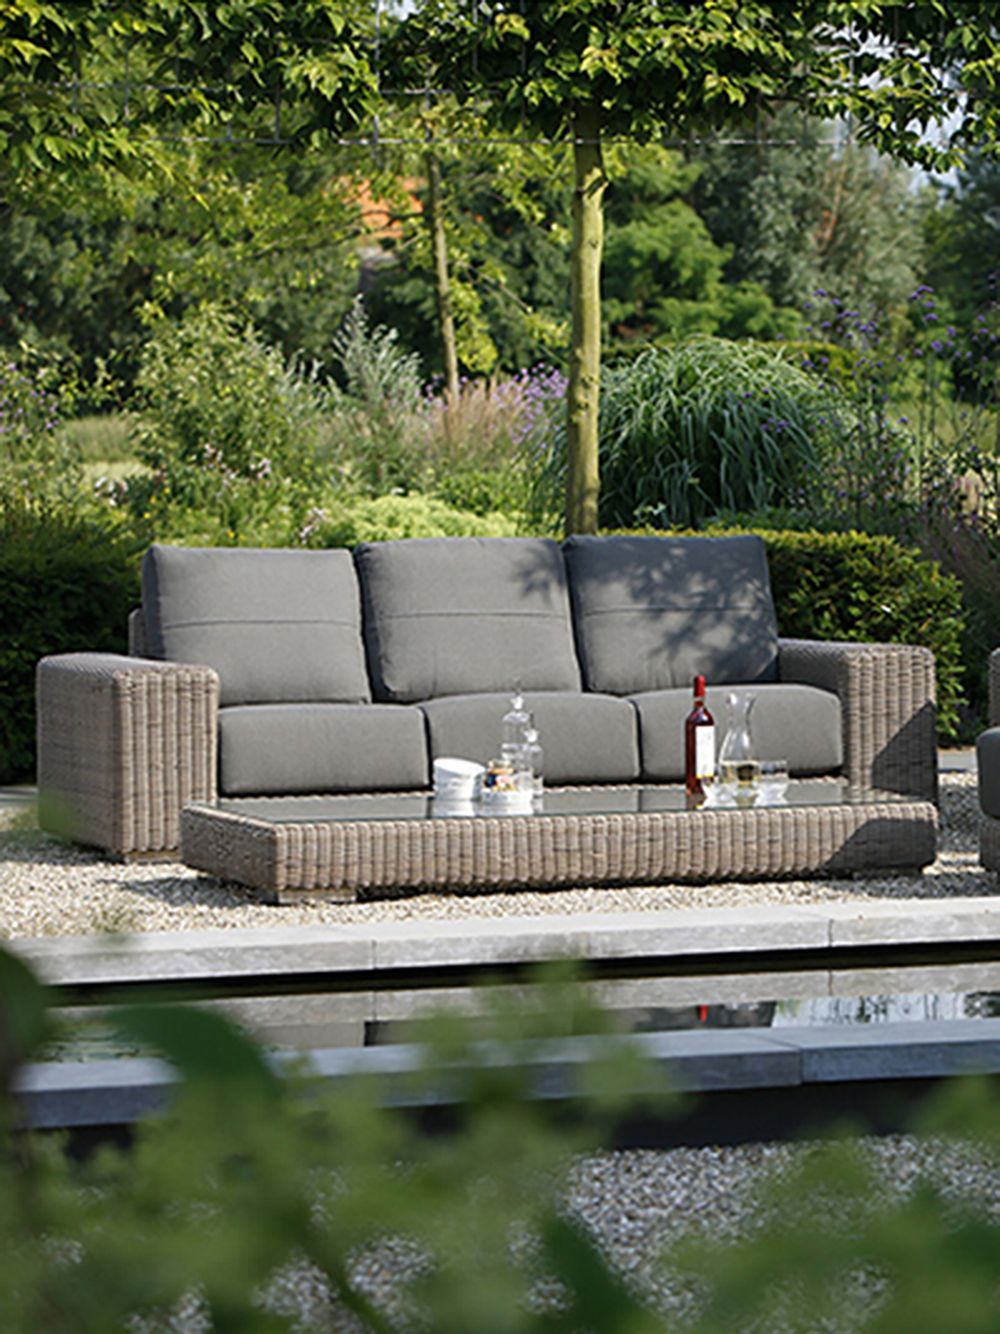 4 seasons outdoor kingston outdoor furniture at john lewis partners rh johnlewis com seasons four outdoor furniture lexington seasons garden furniture bridgend